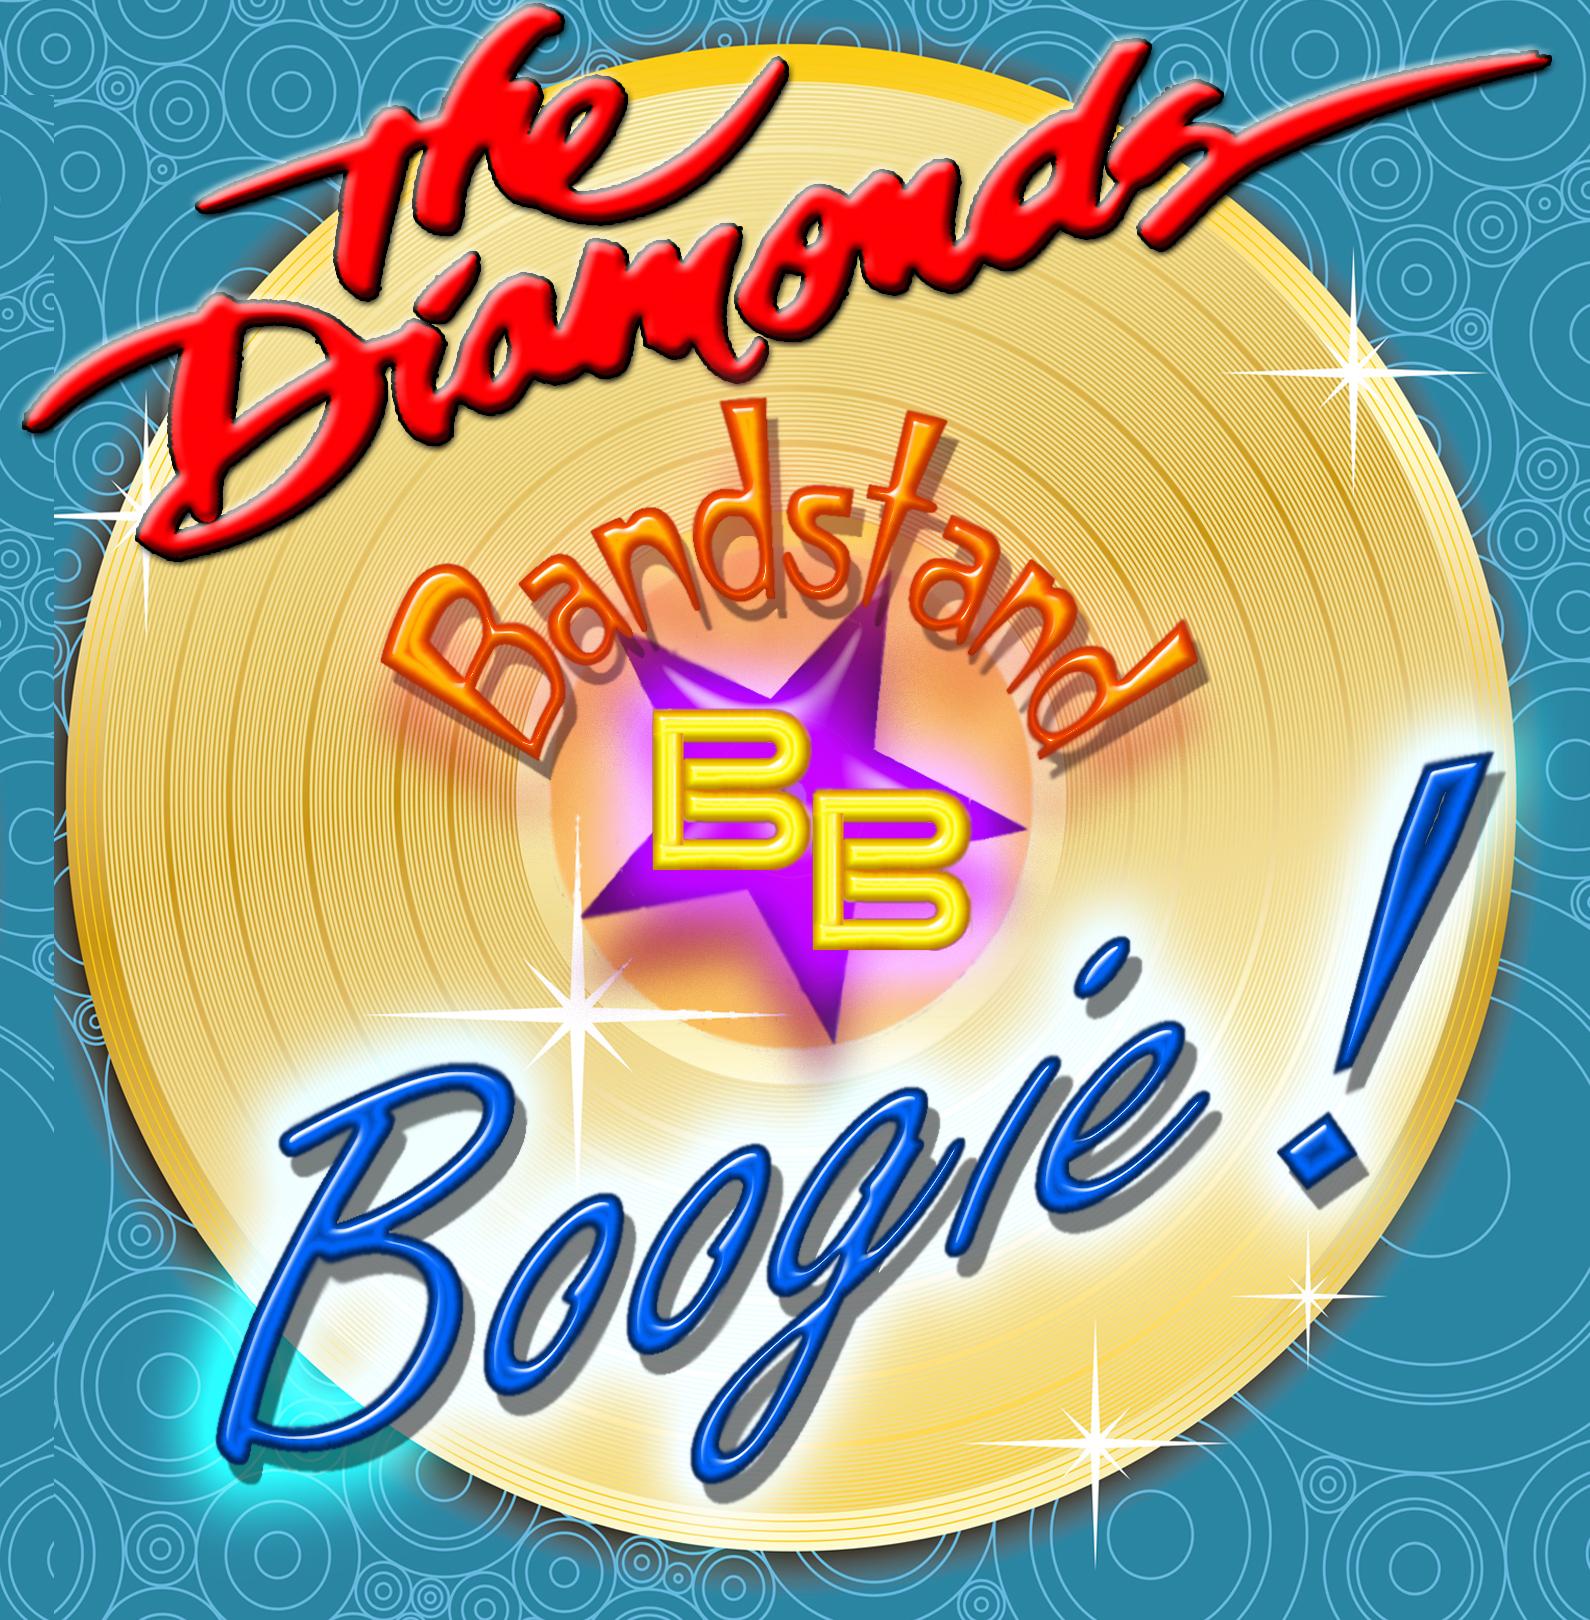 Bandstand Boogie! logo 2019.jpg